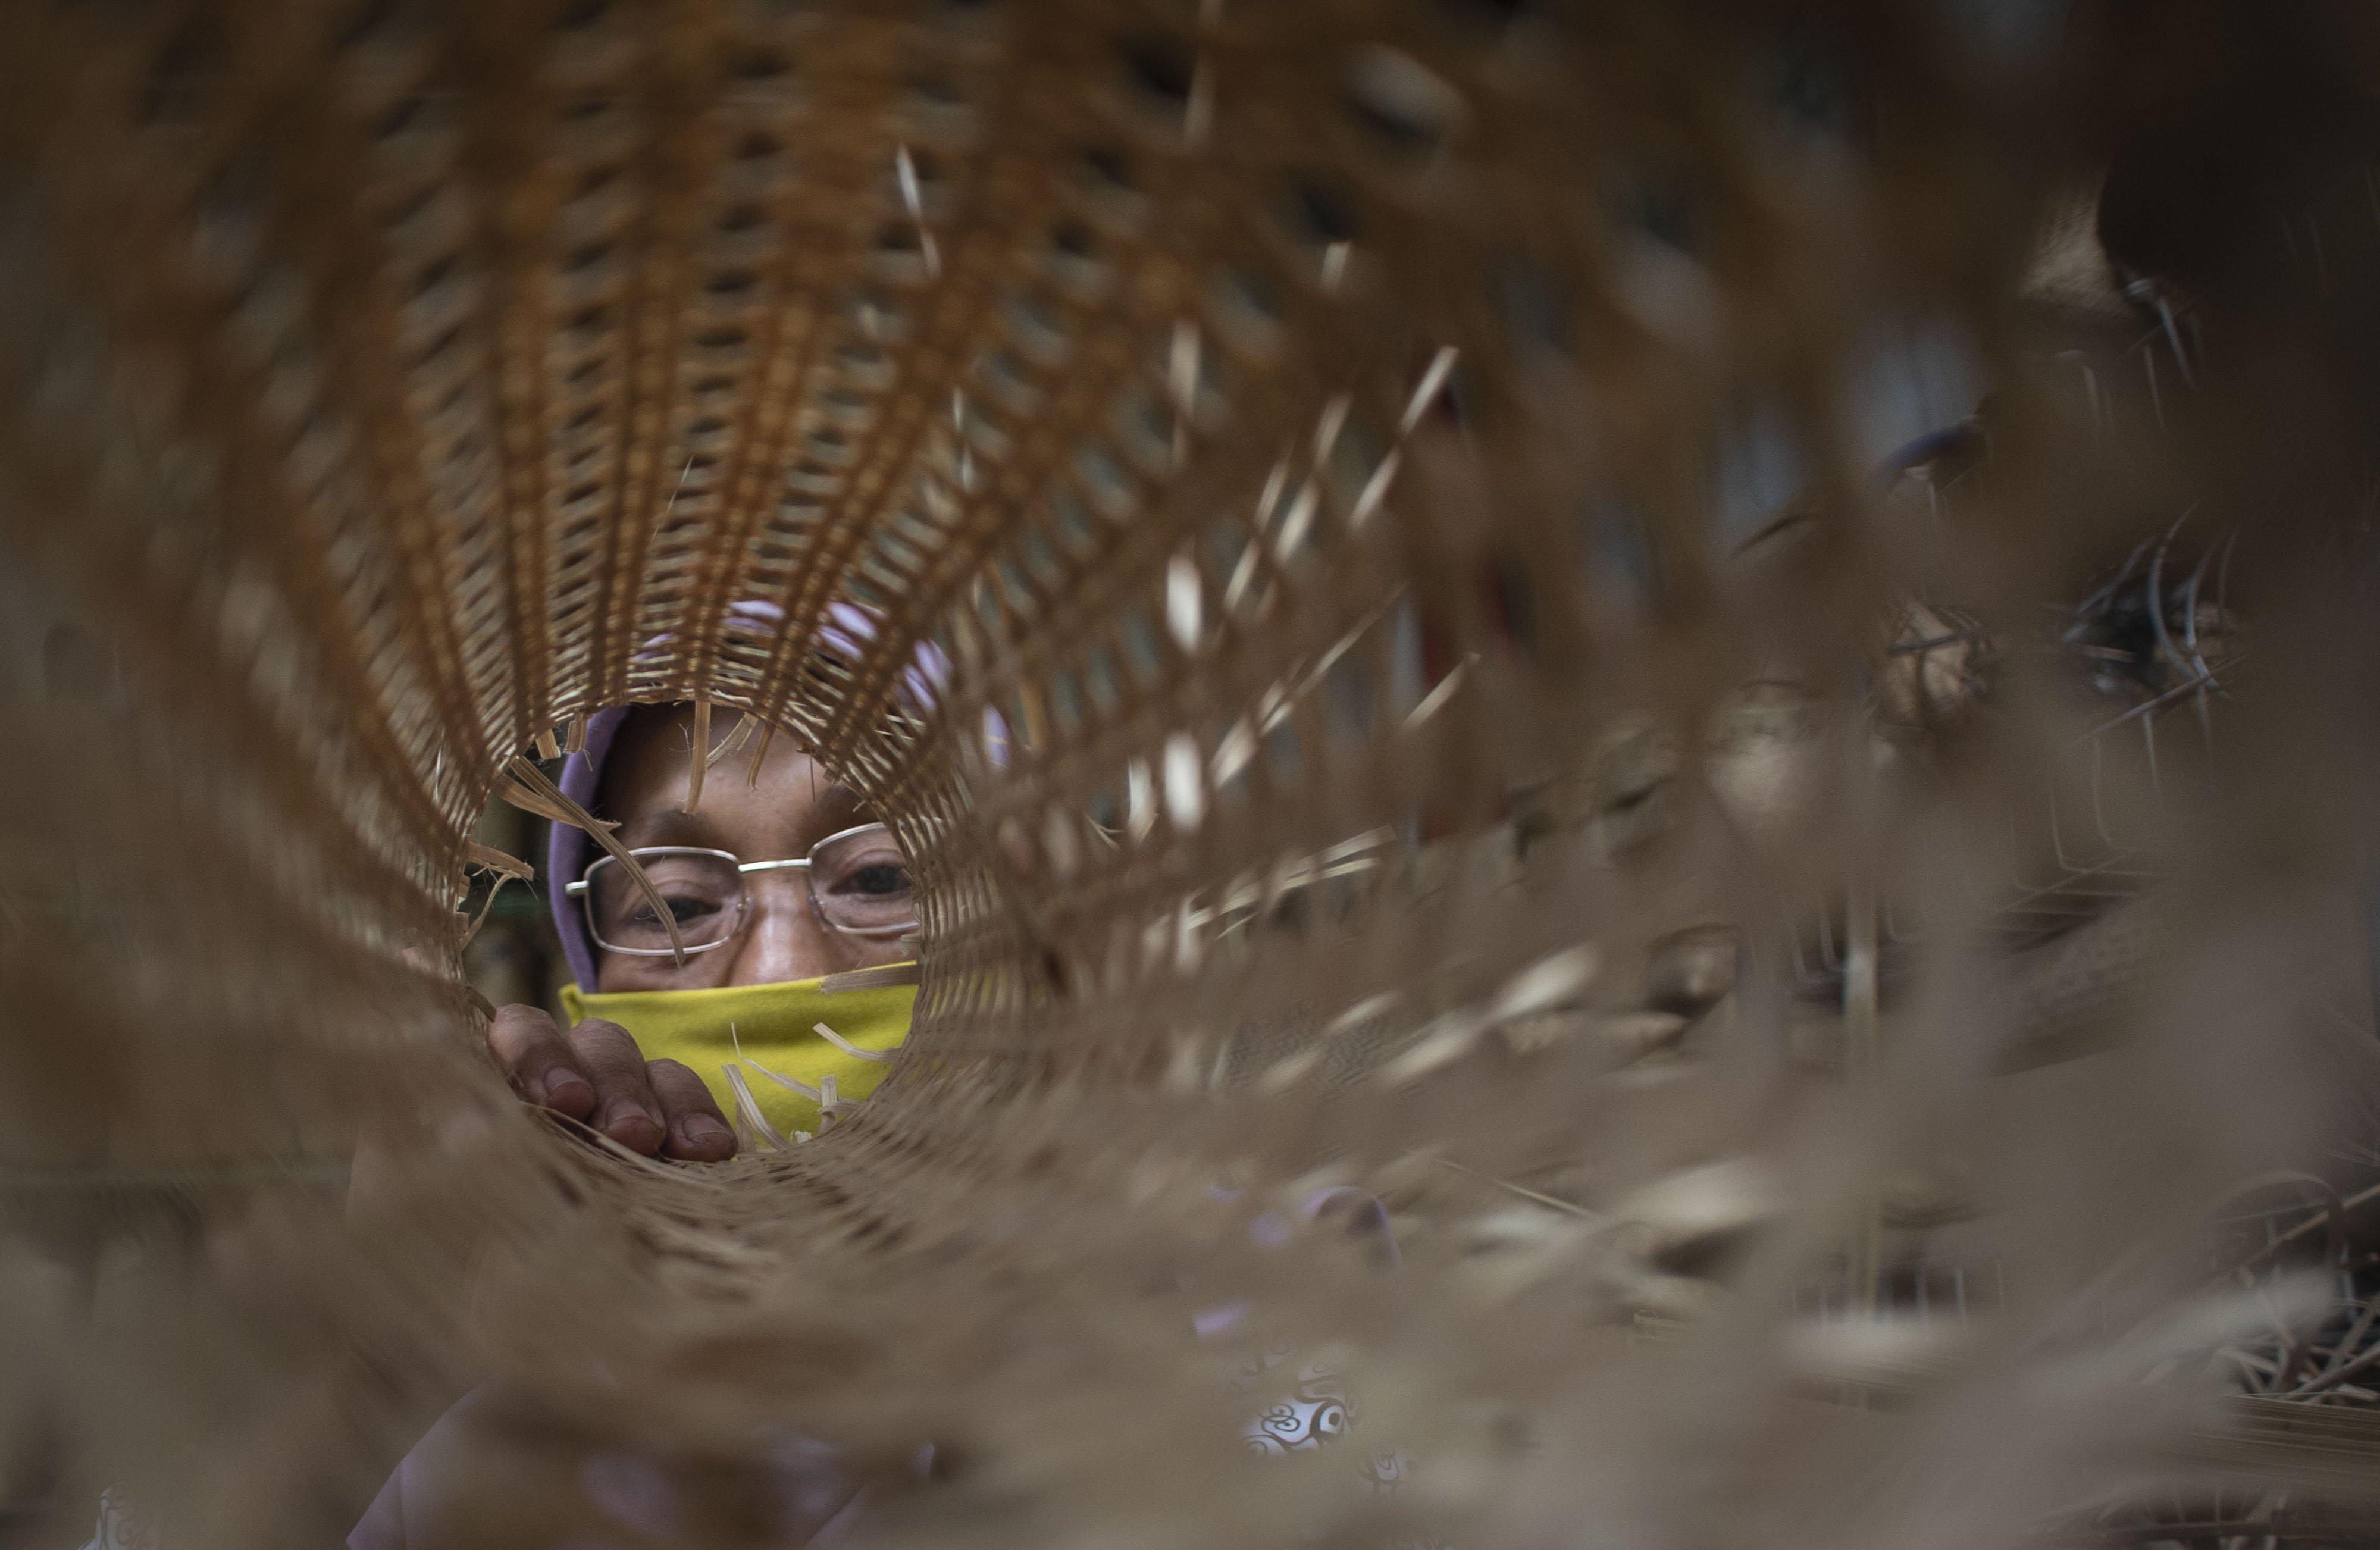 Pengrajin memeriksa struktur anyaman bambu di Desa Loyok, Sakra, Lombok Timur, Nusa Tenggara Barat.